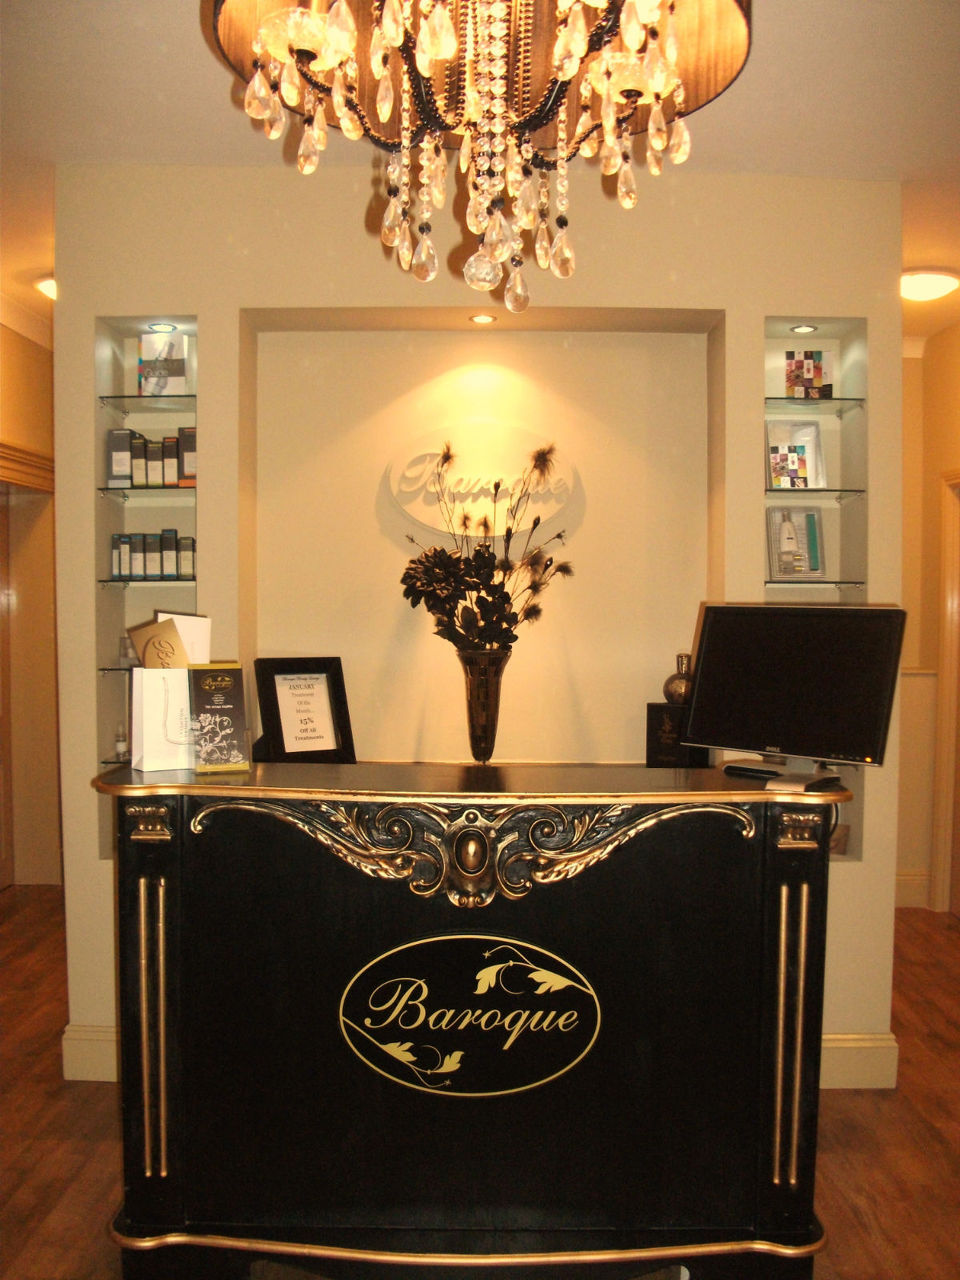 Baroque Beauty salon in sedgefield | Home | Wix.com